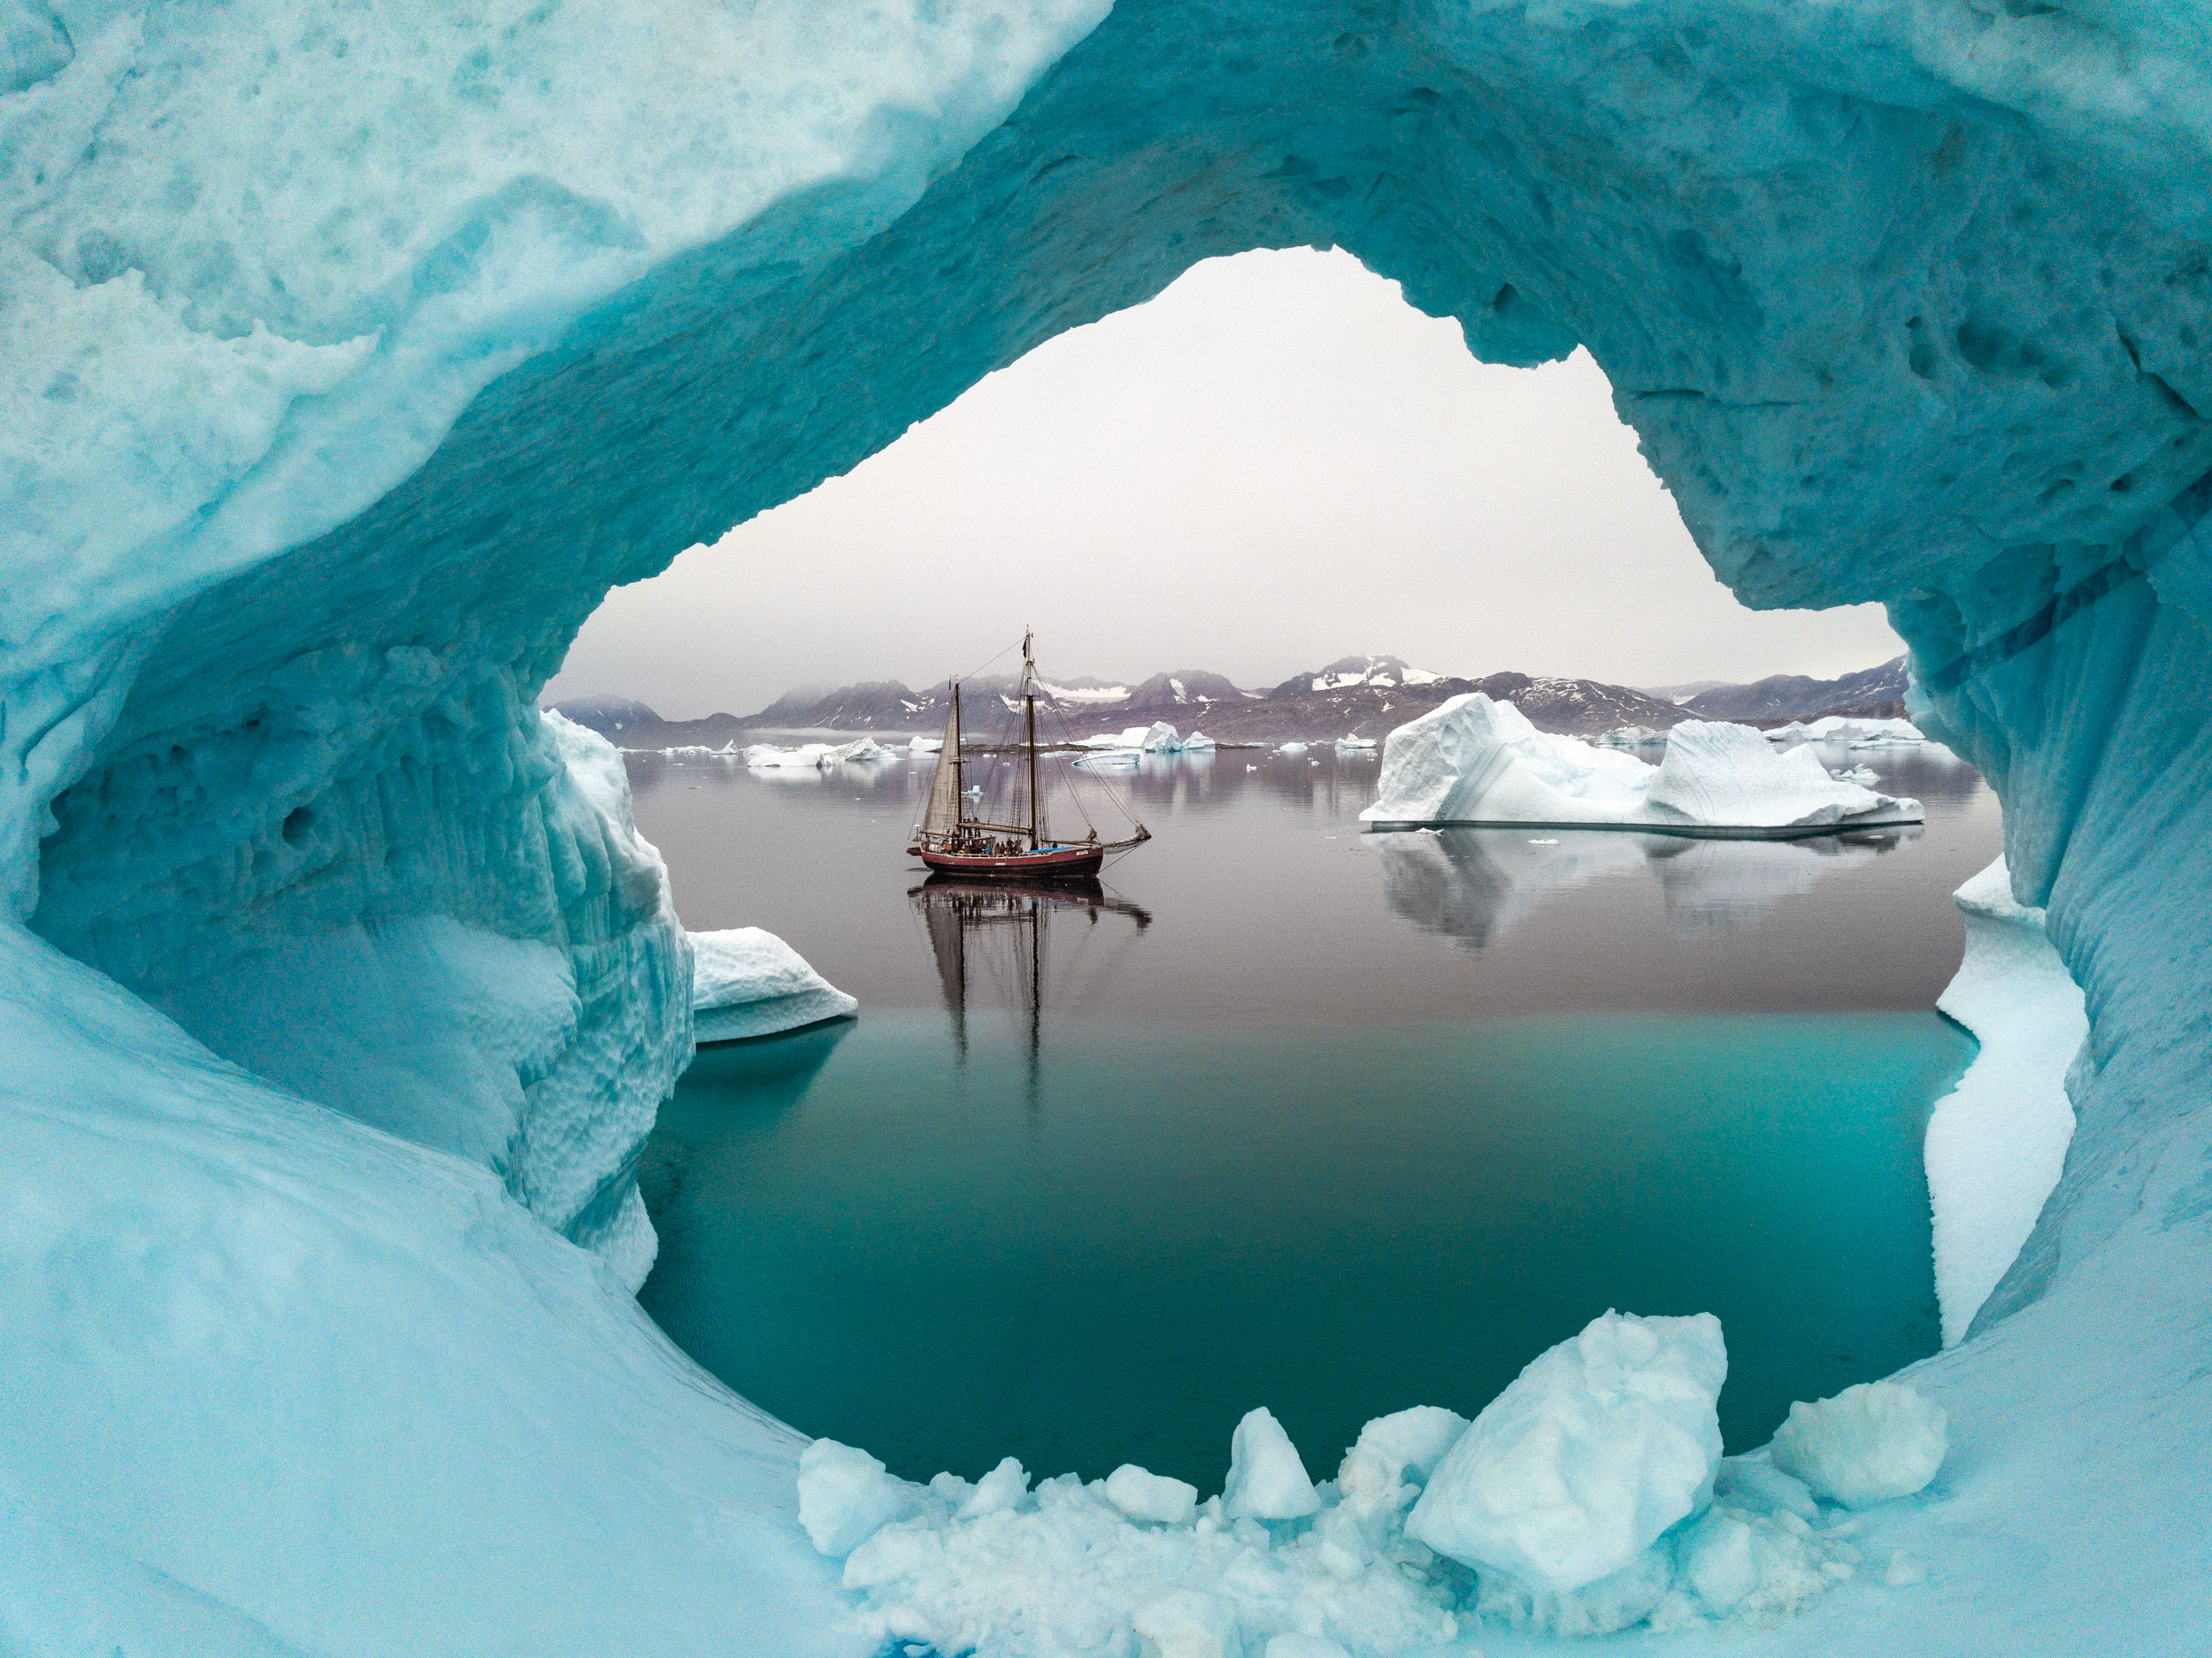 <p><strong>East Greenland Schooner (Waitlist)</strong><br/> September 4-13, 2020</p>